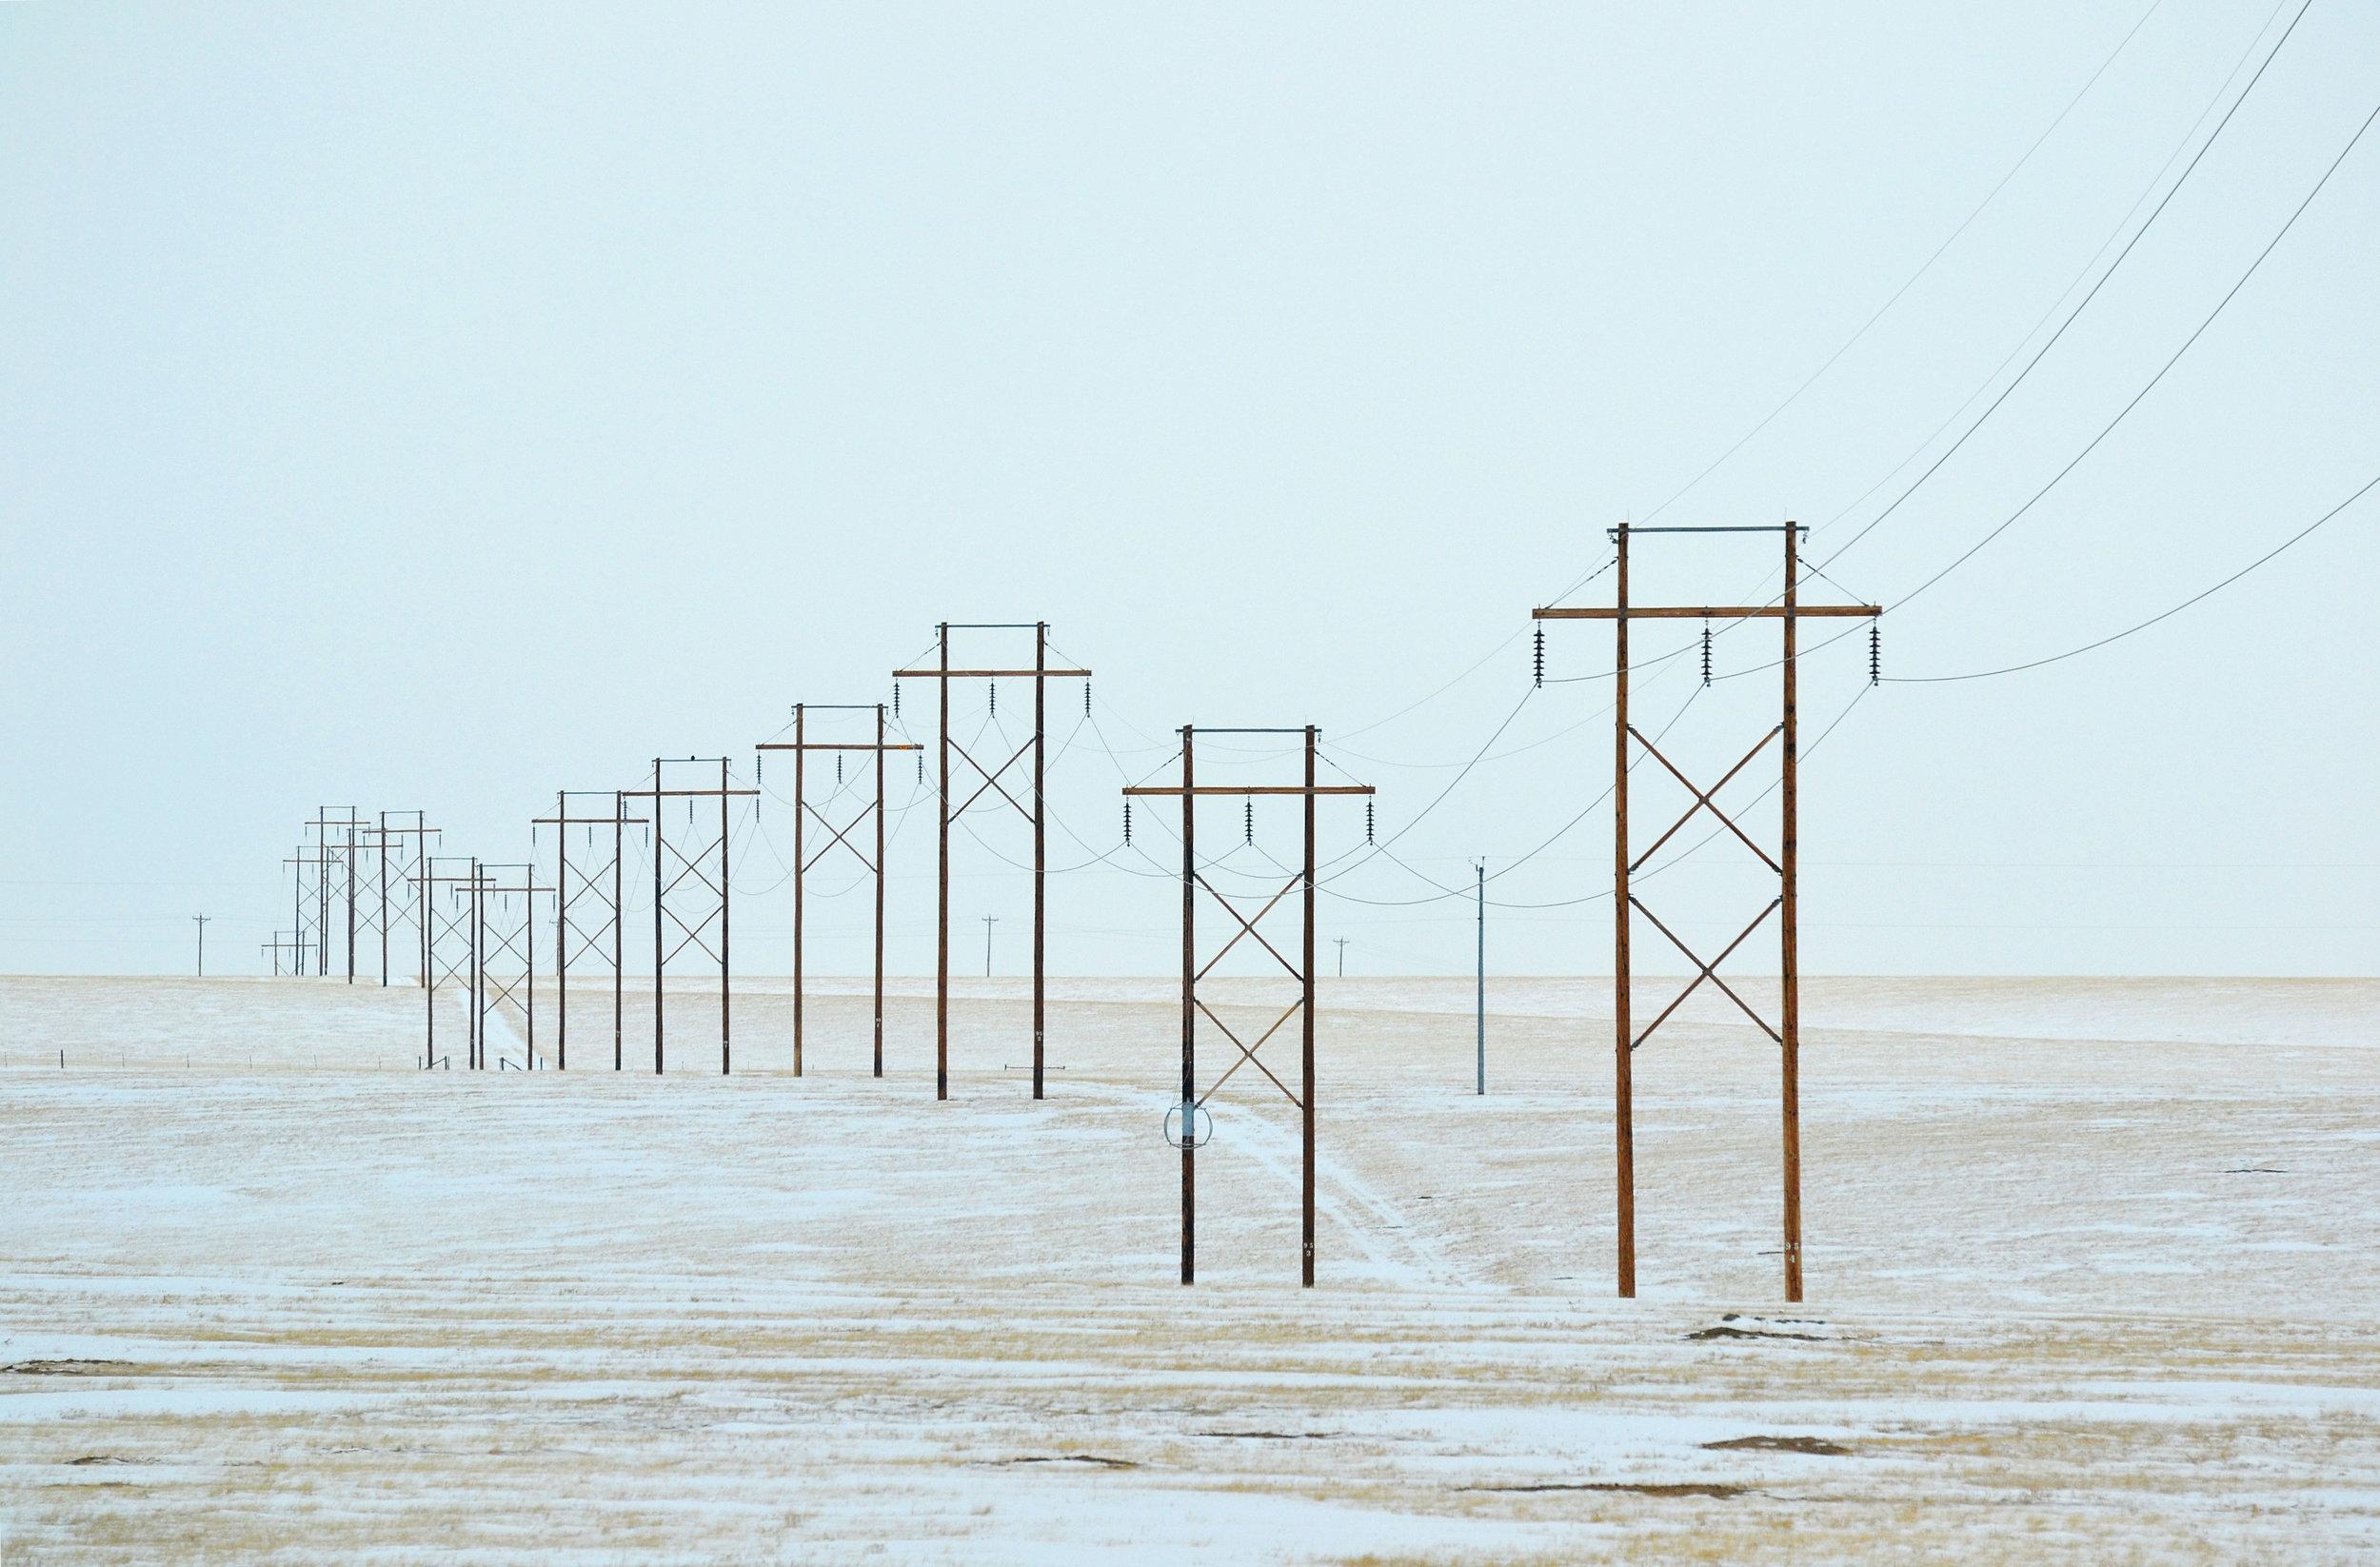 Power lines outside Laramie, Wyoming.